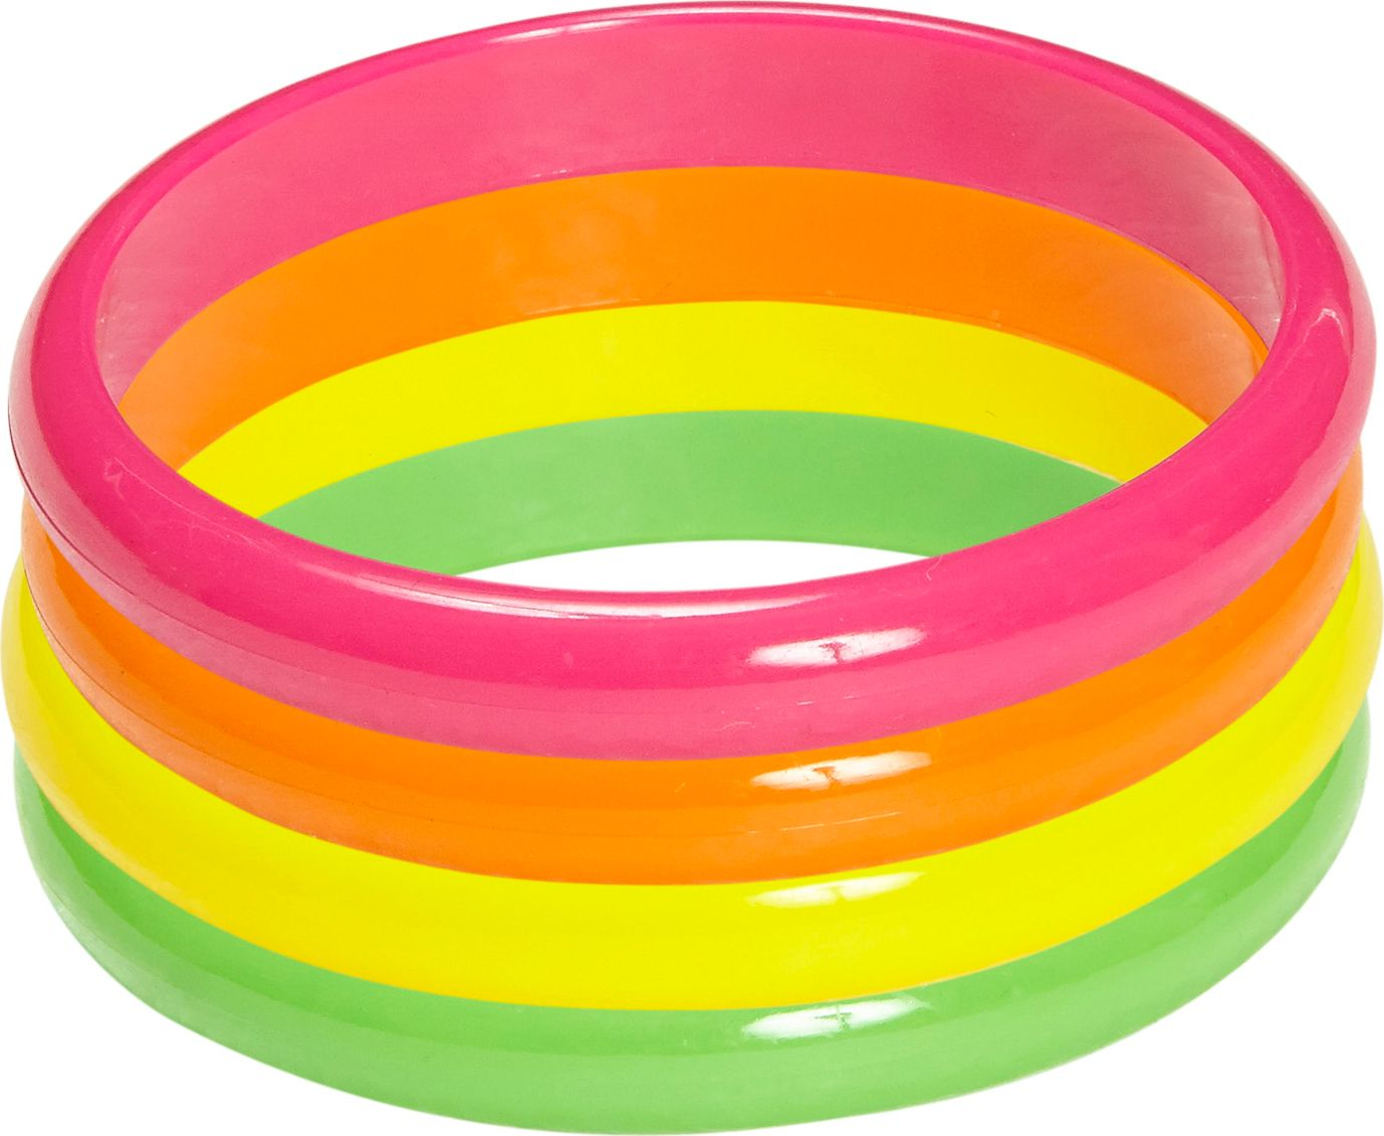 Neon ring armbanden 4 stuks